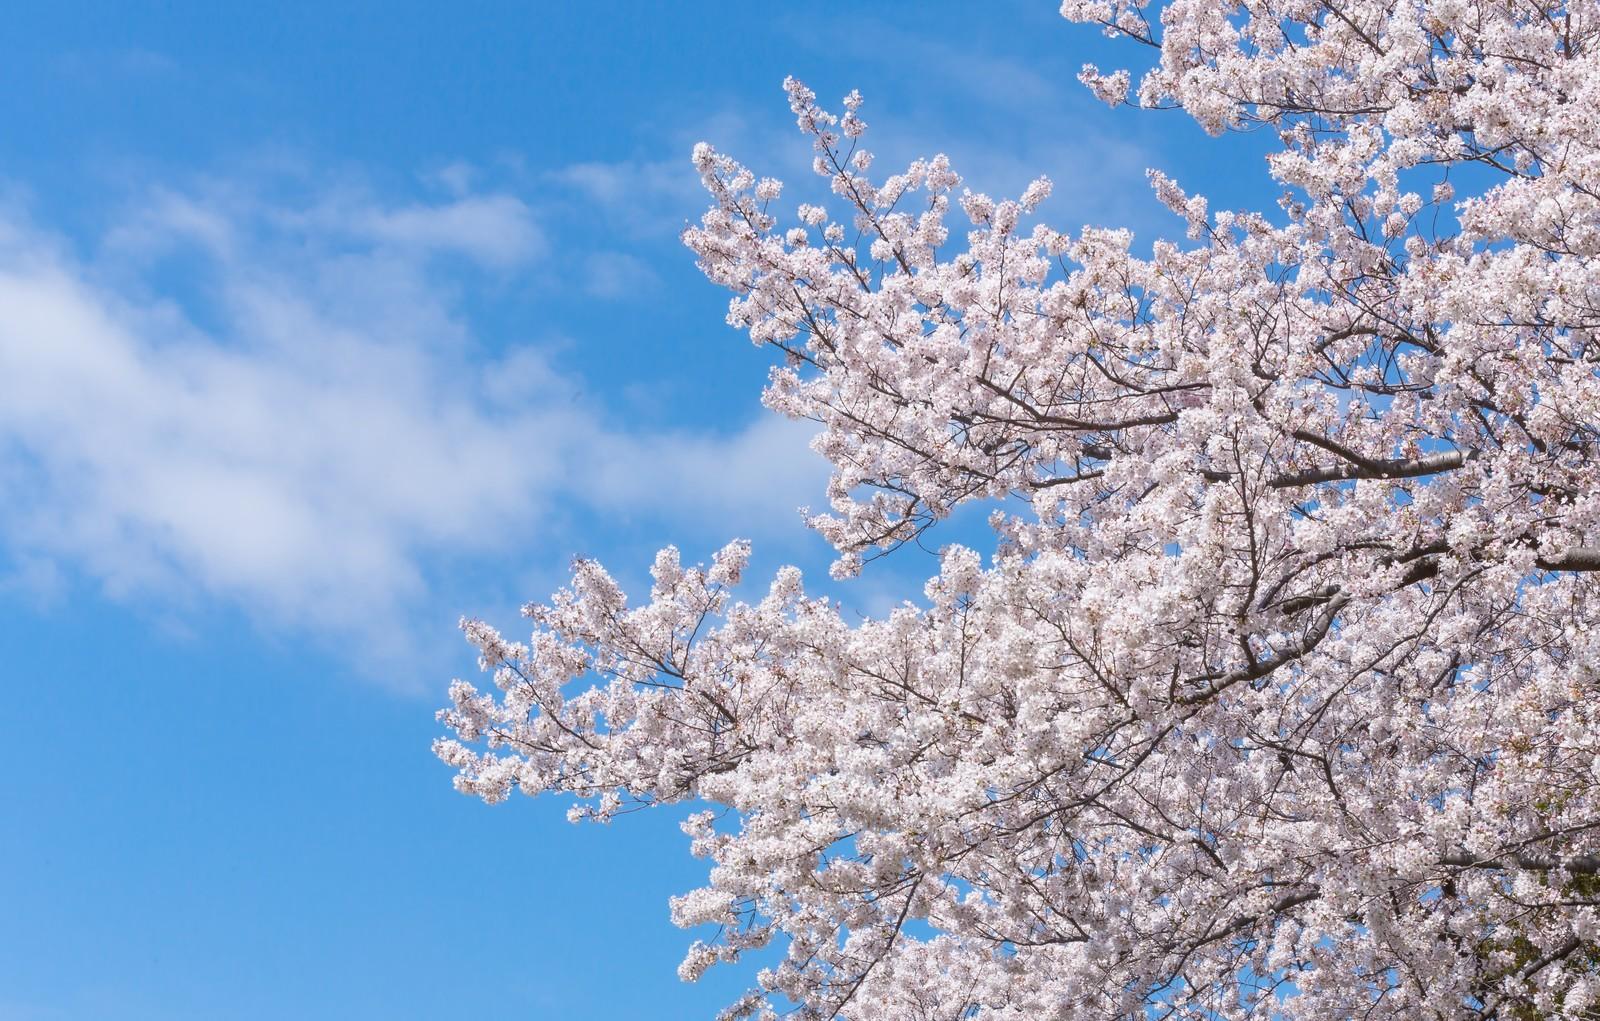 【味噌坐 玉響】【焼ジビエ罠 中目黒】夢屋お花見企画!